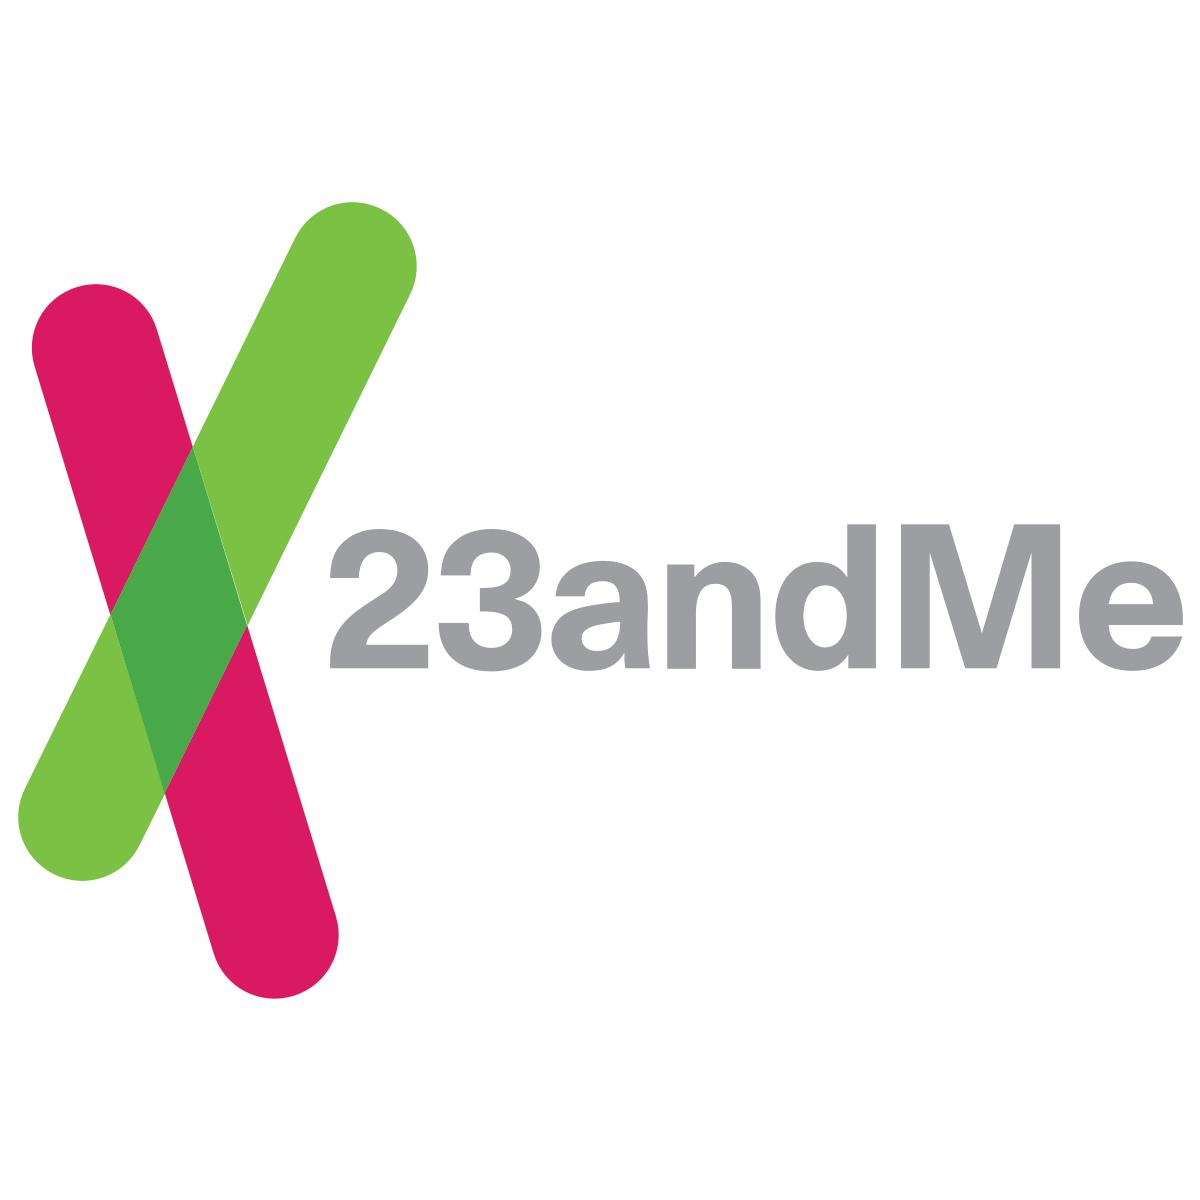 DNA Genetic Testing & Analysis - 23andMe